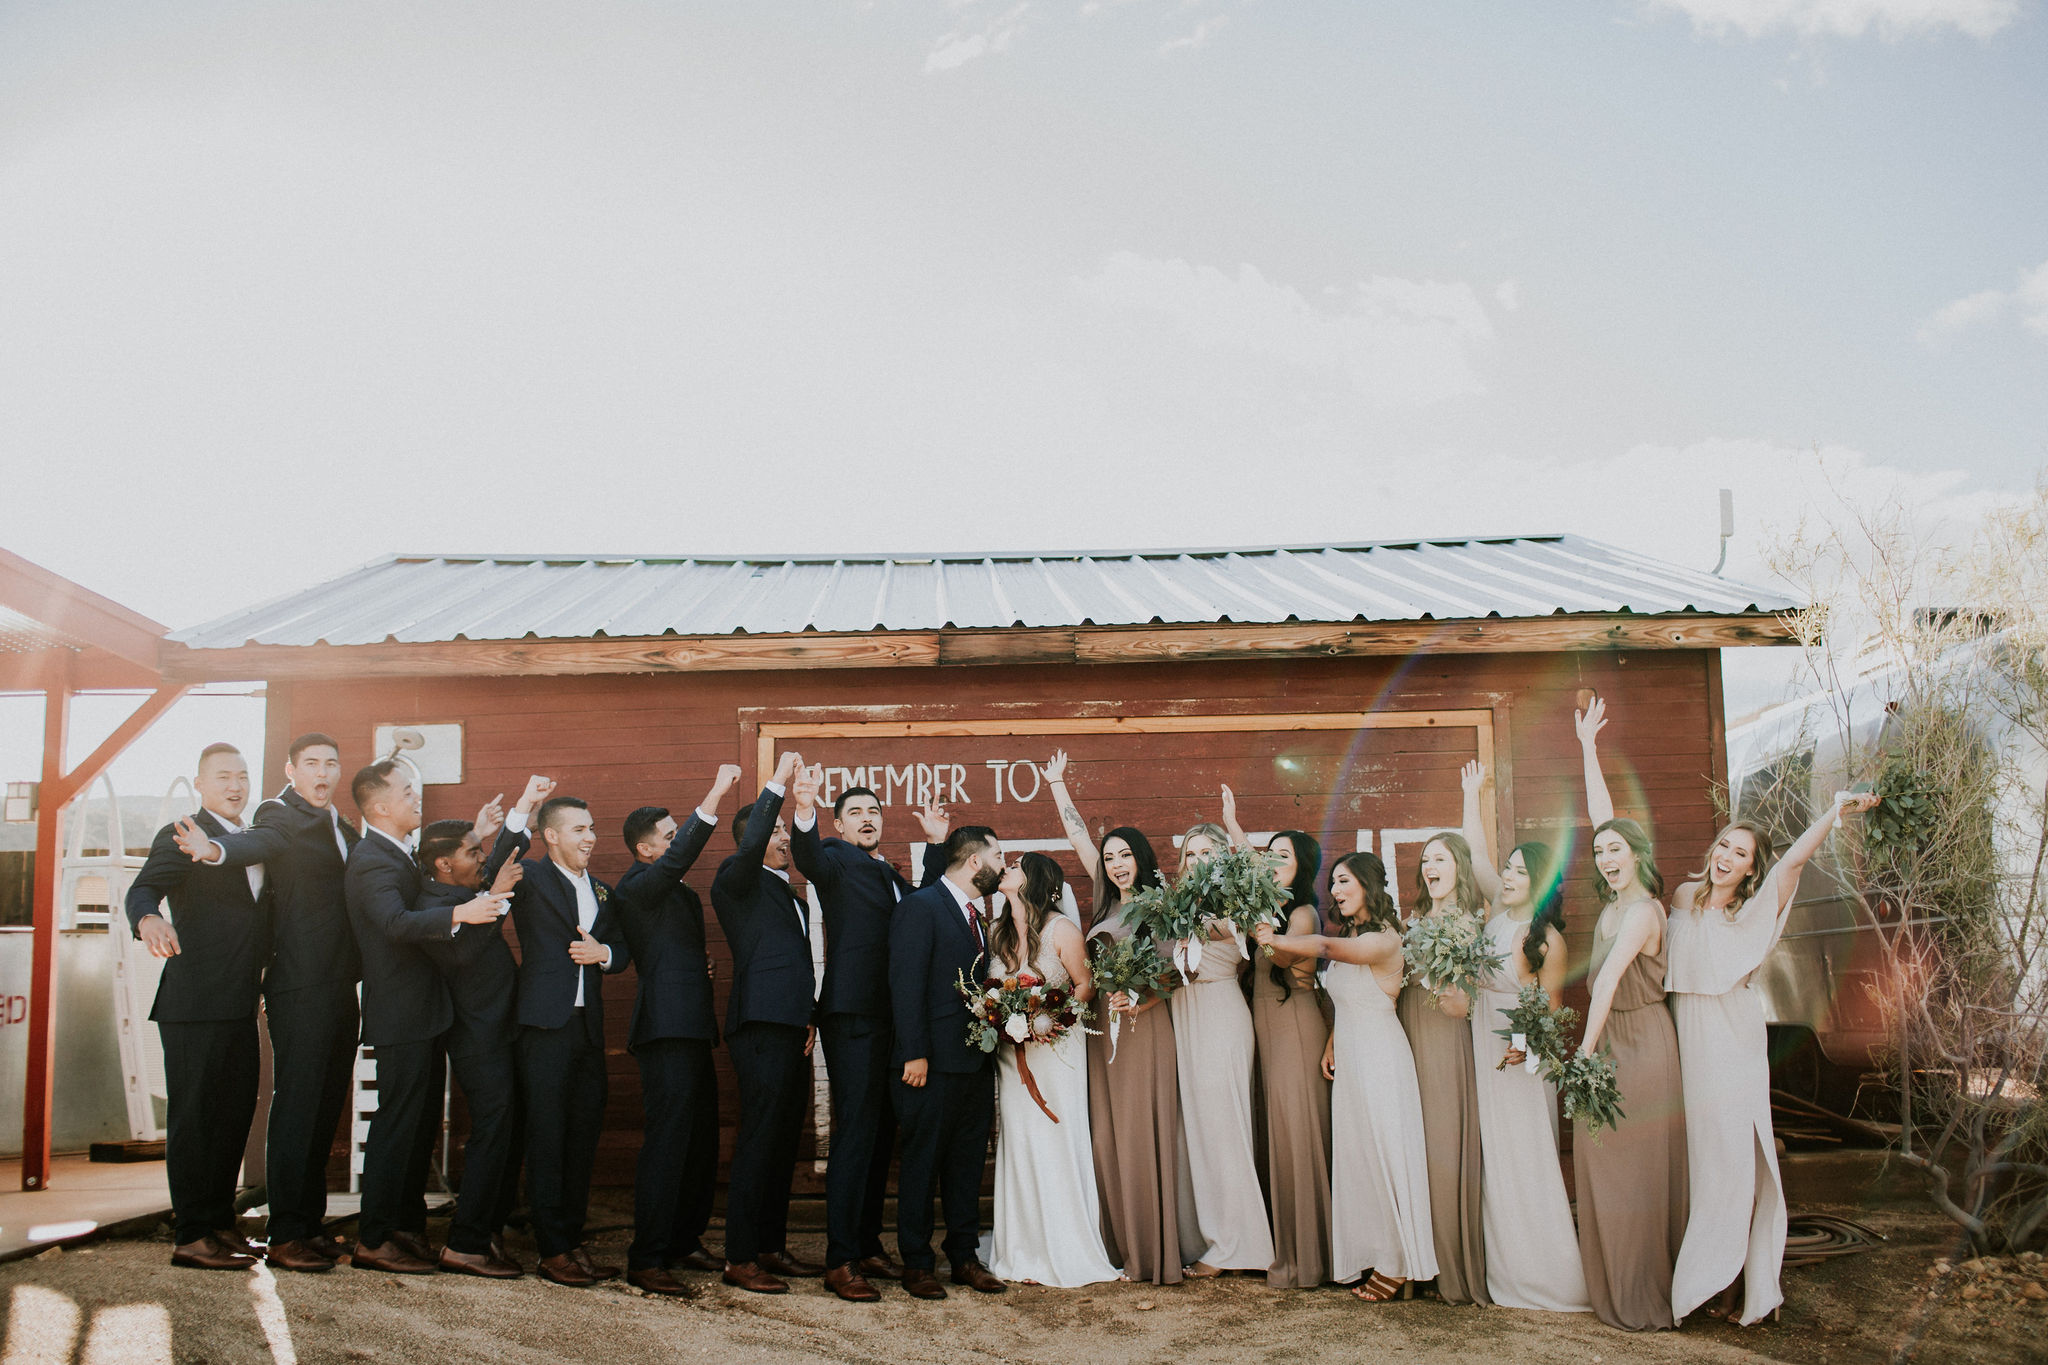 RimrockRanch-JoshuaTree-Wedding-Jami-Laree-423.jpg